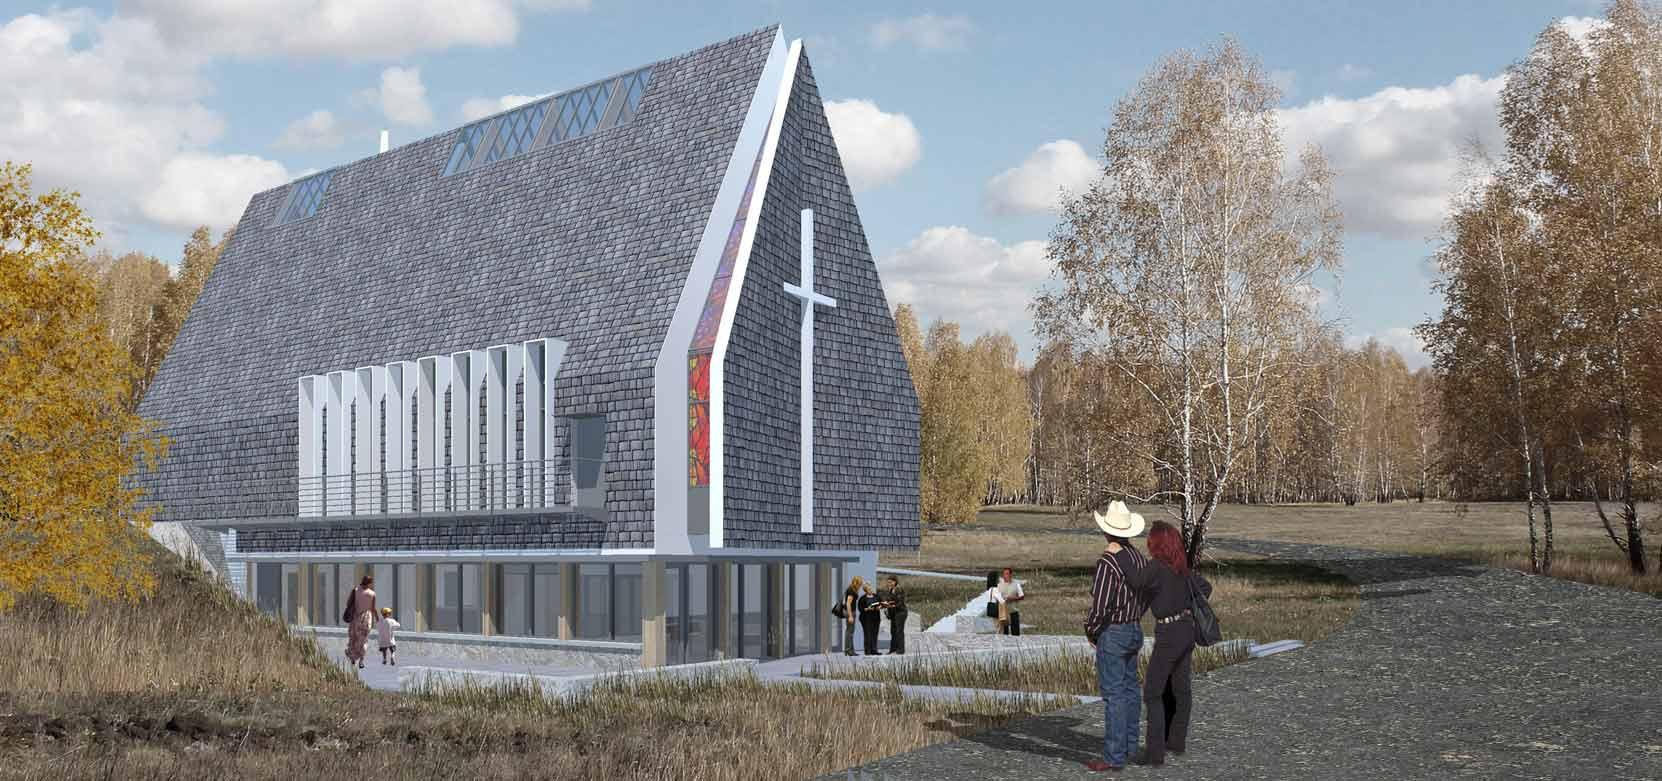 Doig River Community Church, Rose Prairie, BC